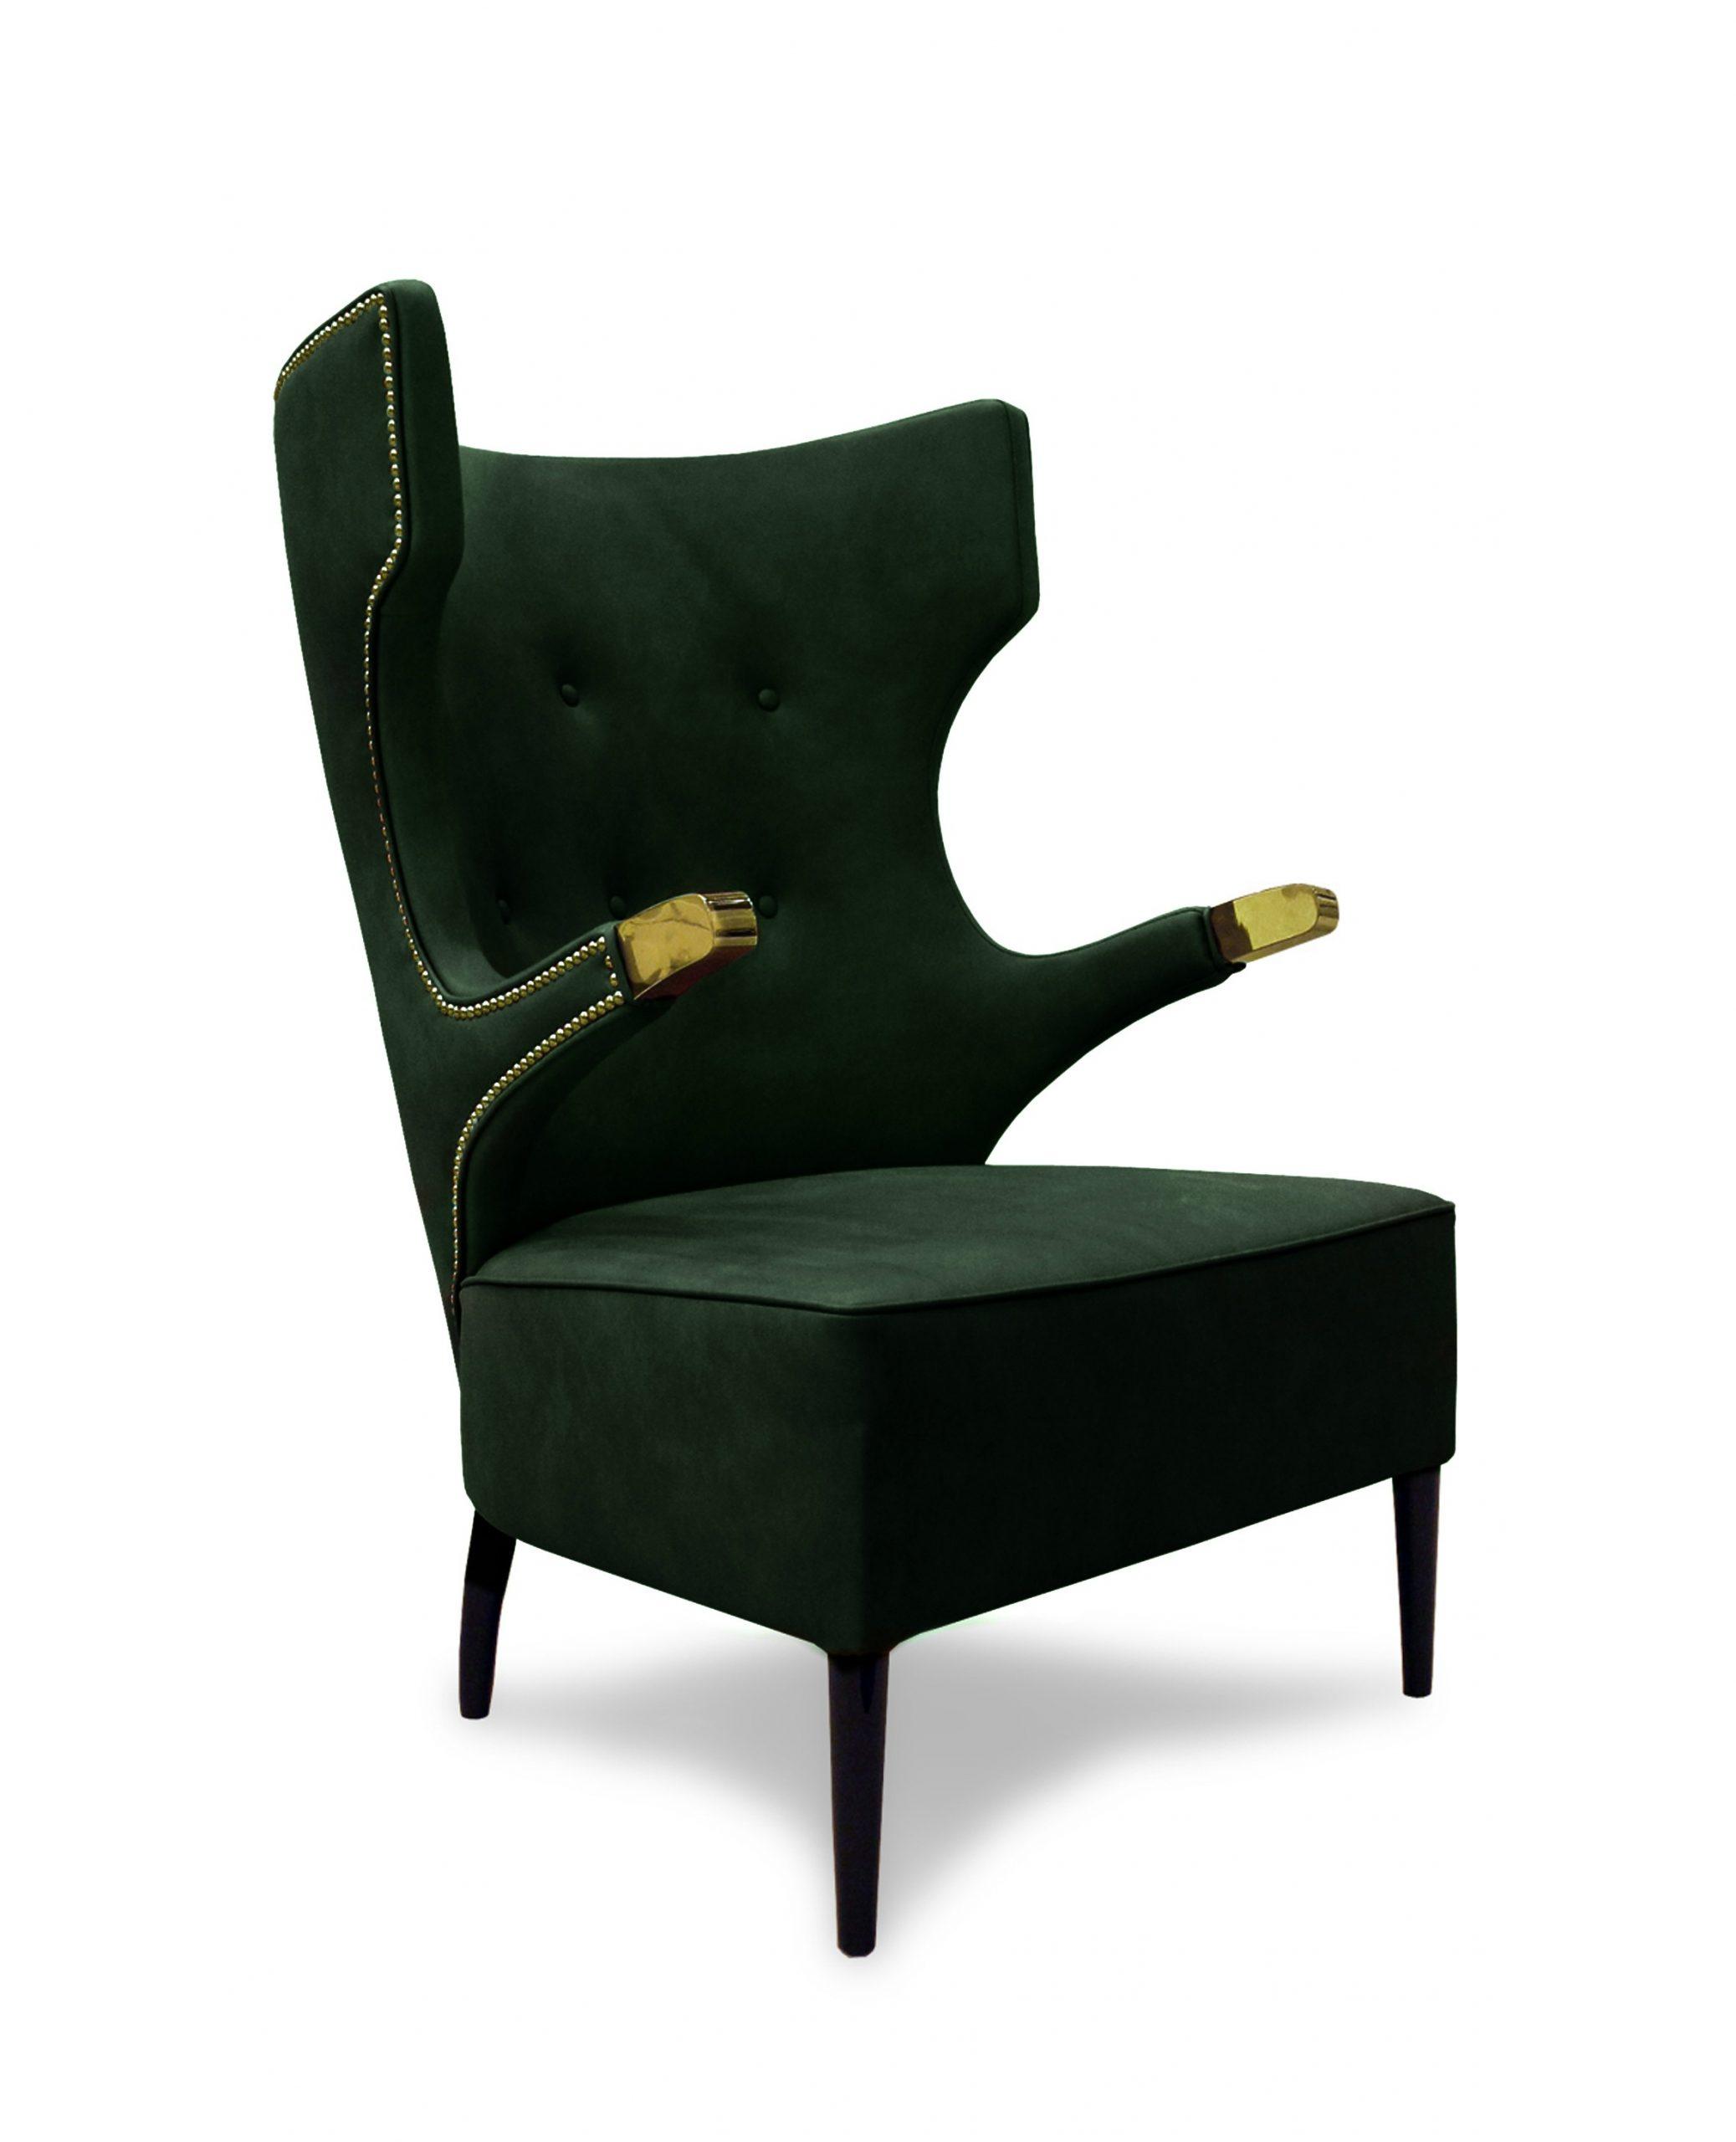 allen saunders Best Allen Saunders Interiors Inspirations sika armchair 3 HR 2 scaled